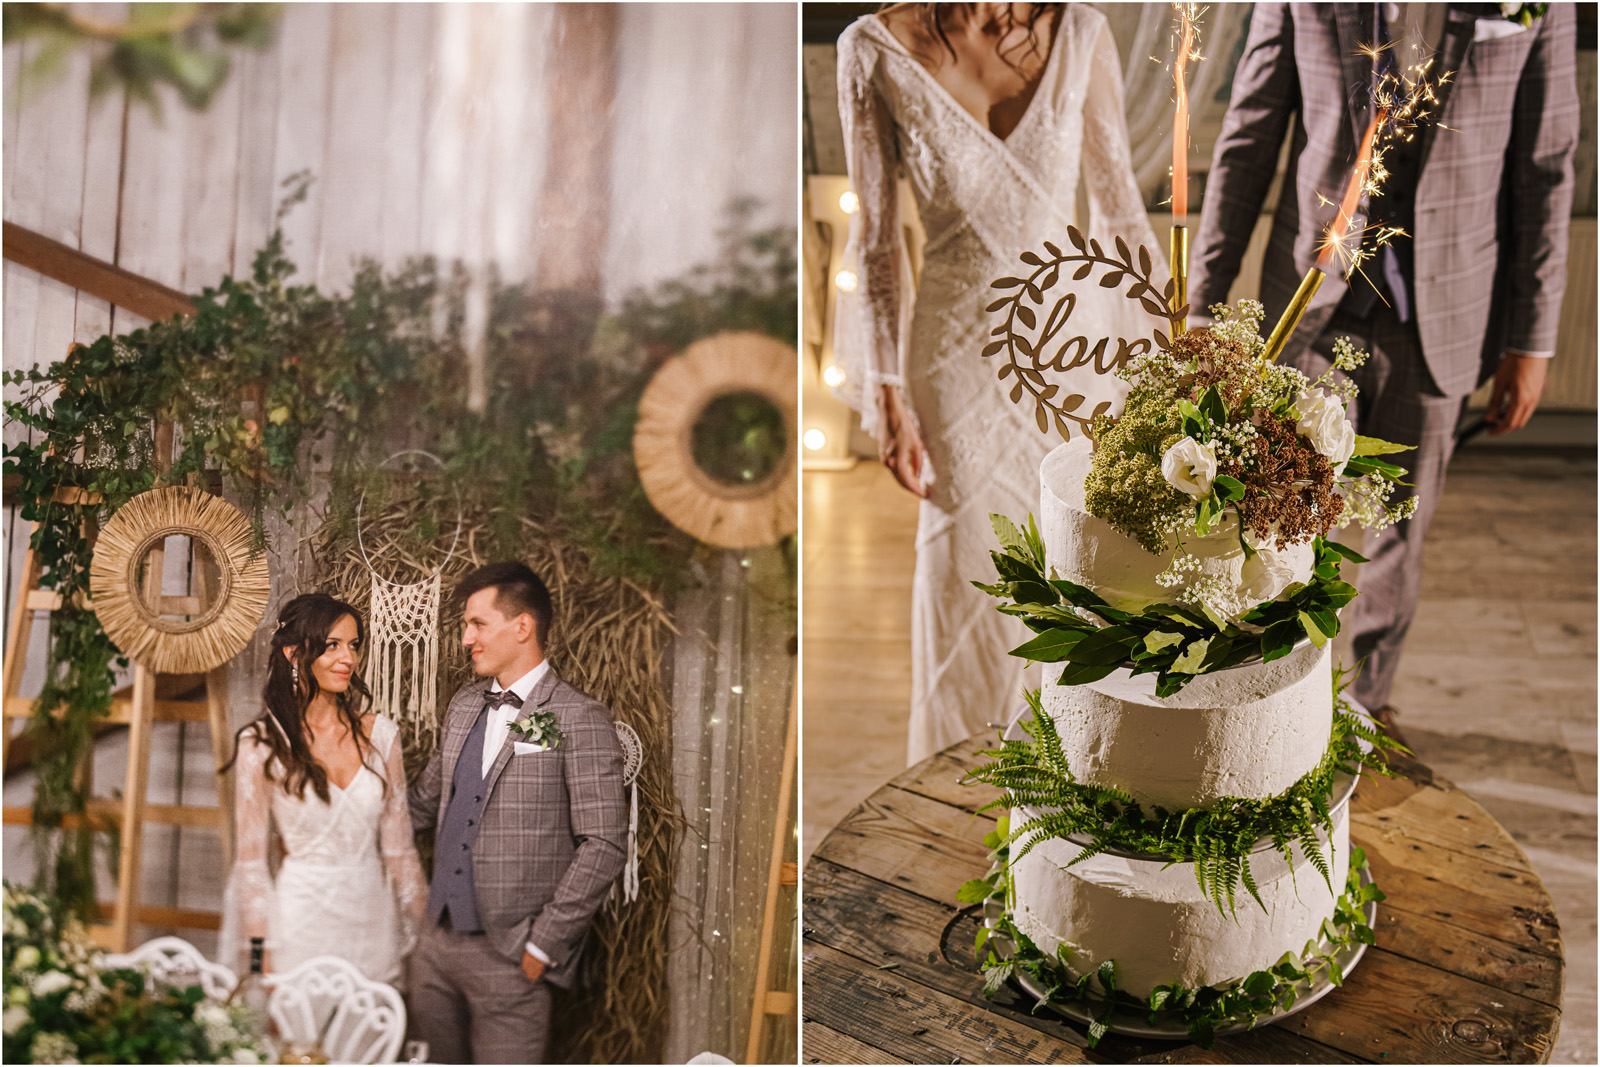 Ania & Mateusz | boho wesele w Stodole pod Kasztanami 86